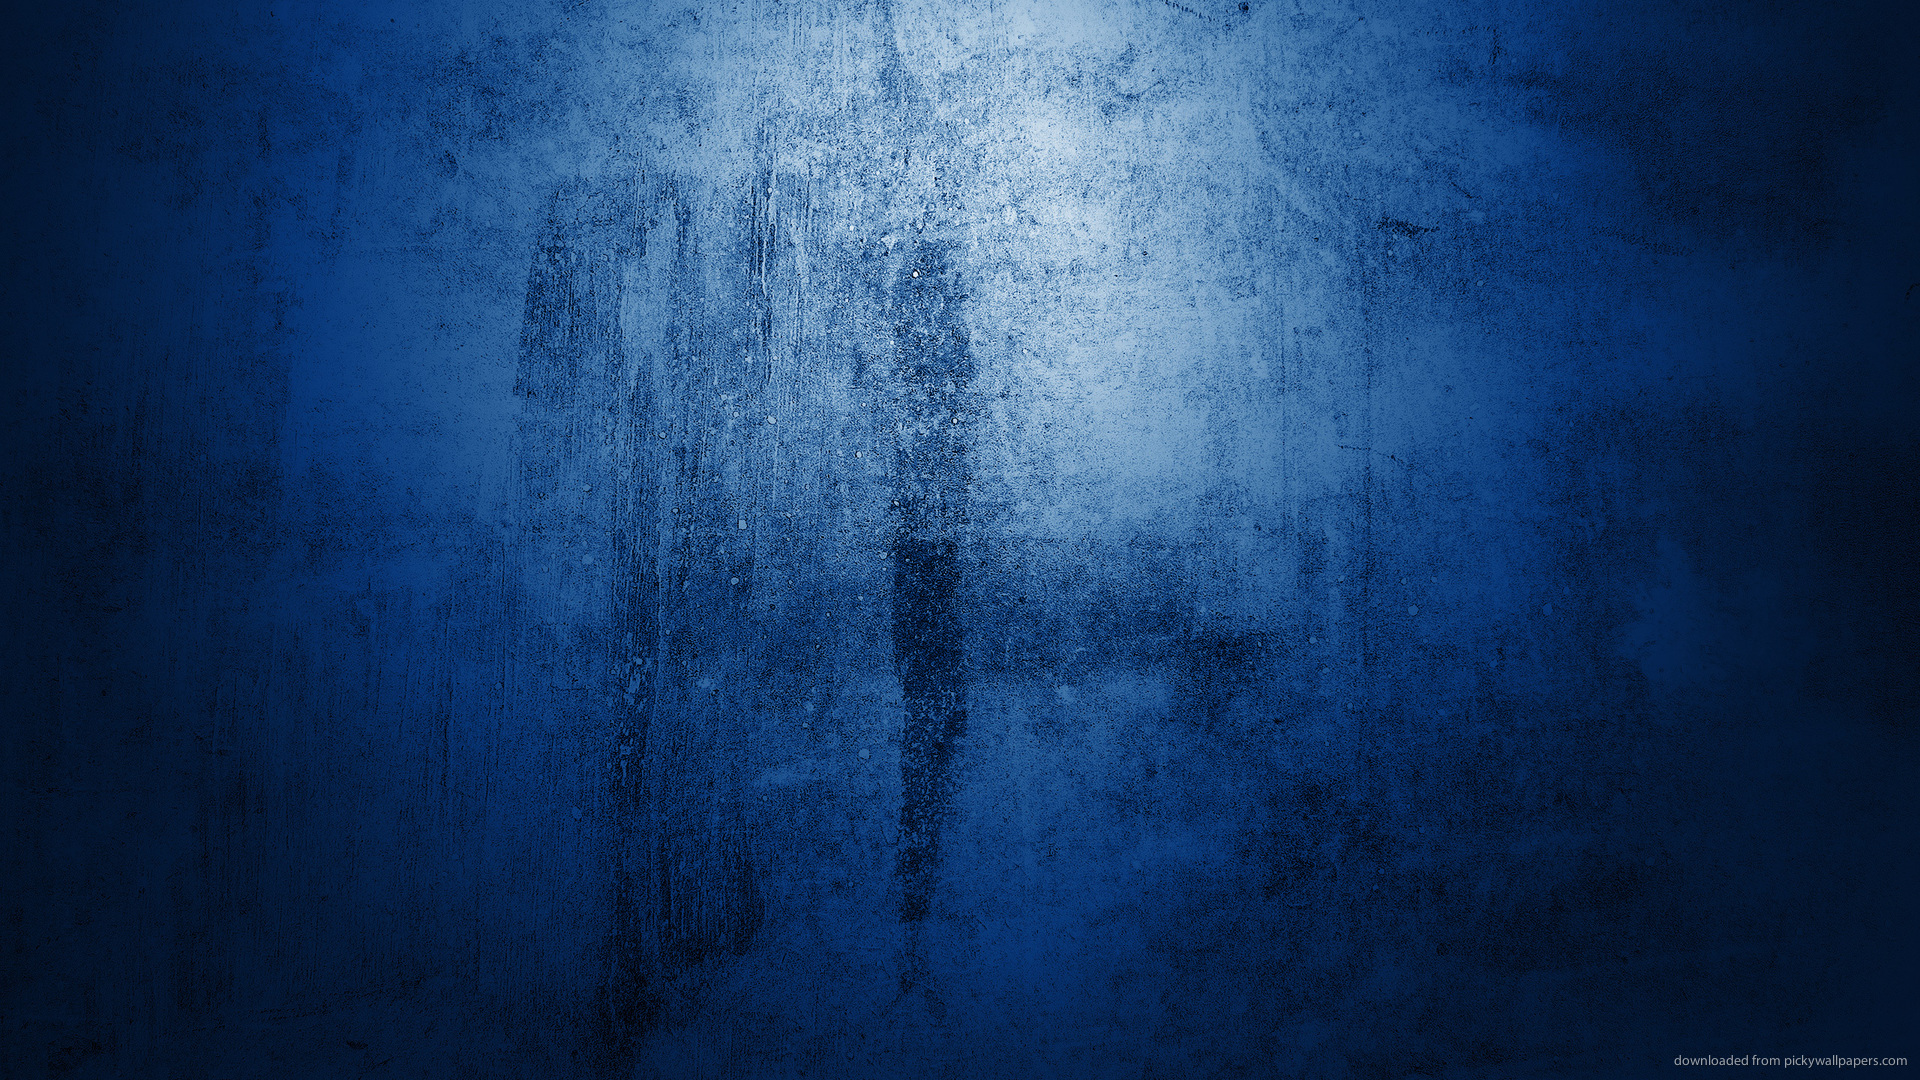 1920x1080 Blue Grundgy Background Wallpaper 1920x1080